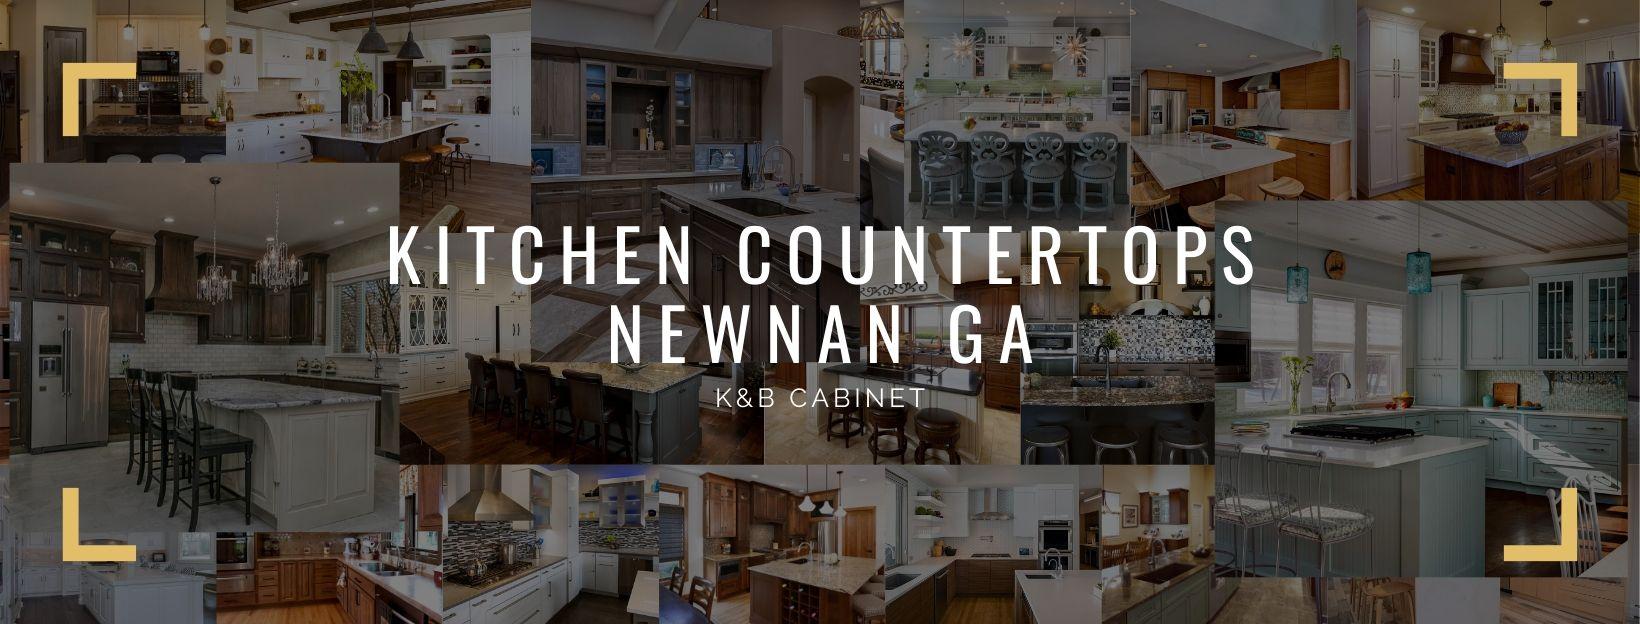 Kitchen Countertops Newnan GA